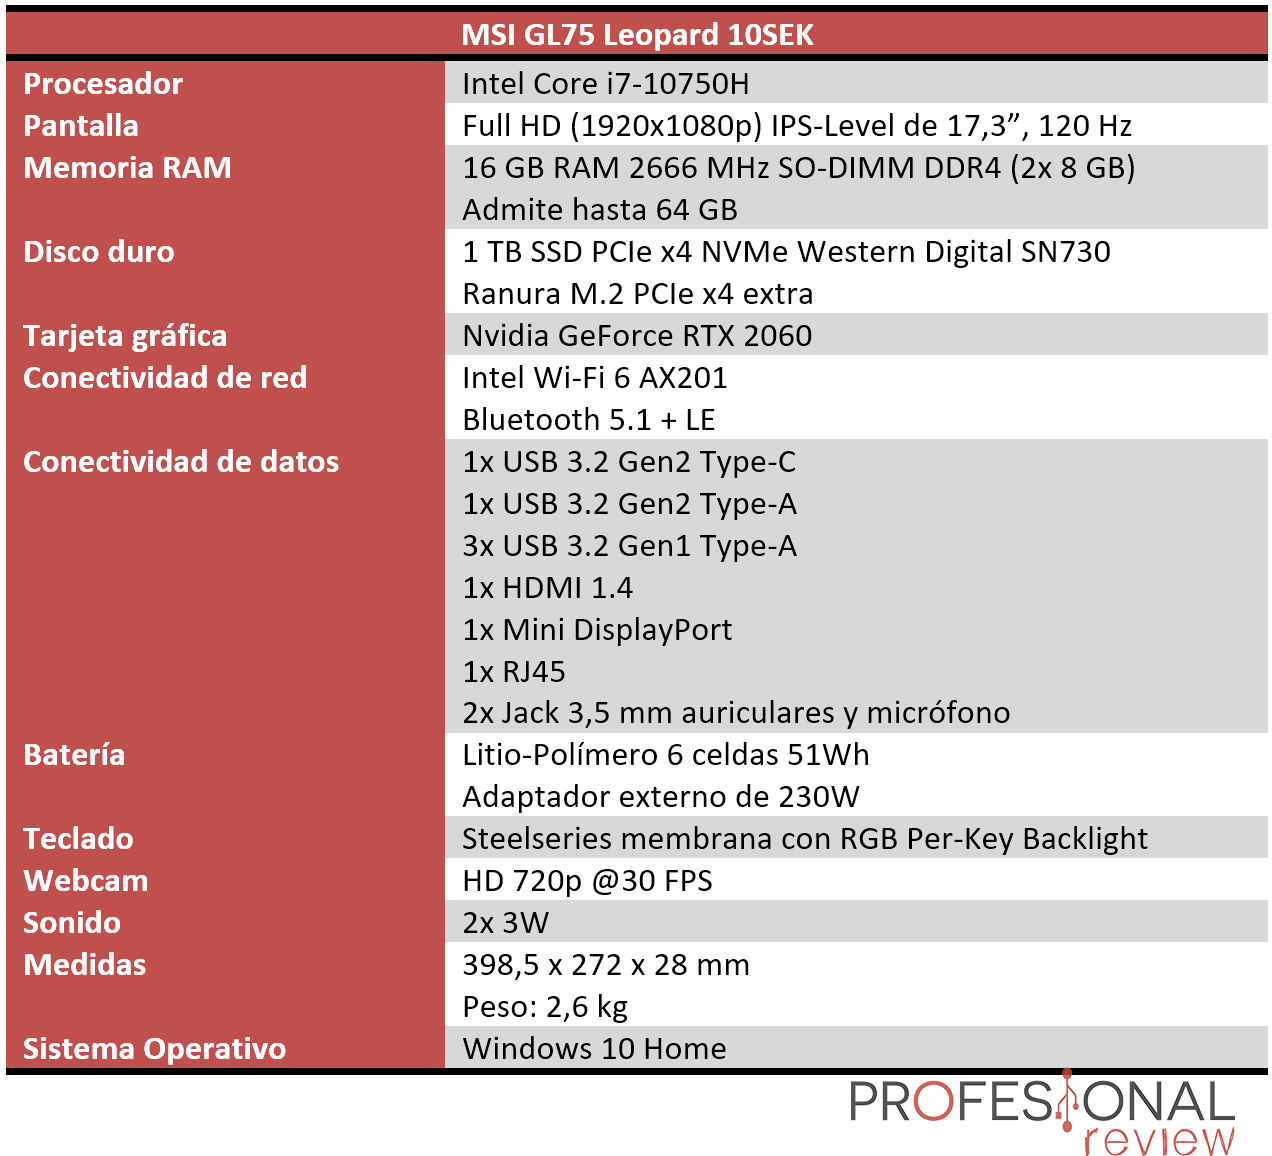 MSI GL75 Leopard 10SEK Características